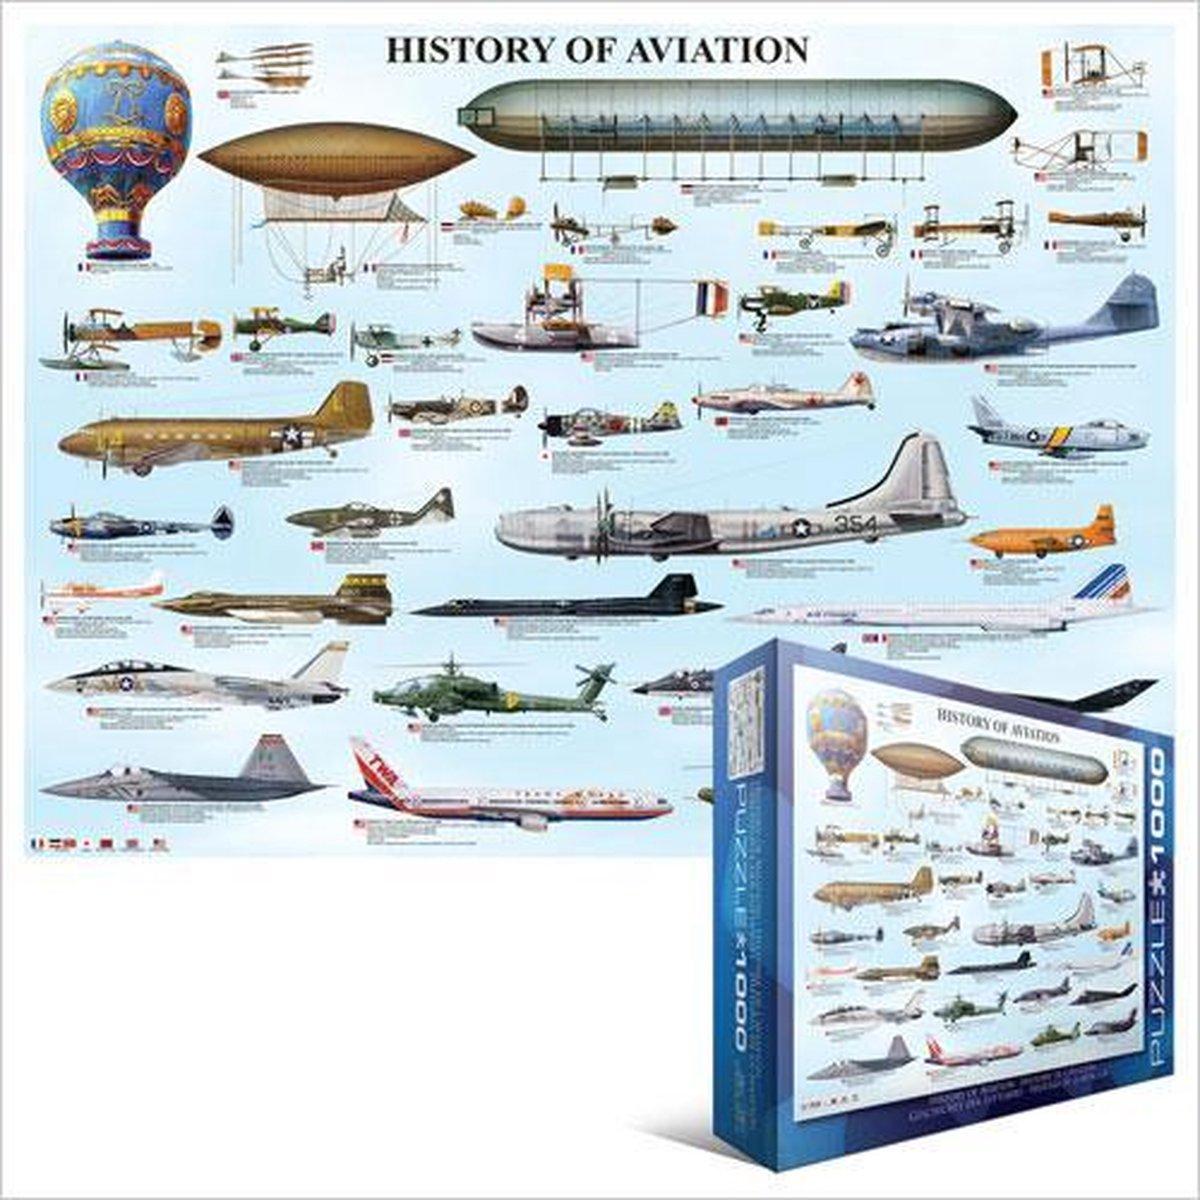 Eur-6000-0086,Puzzel history of aviation eurographics 1000 stuks